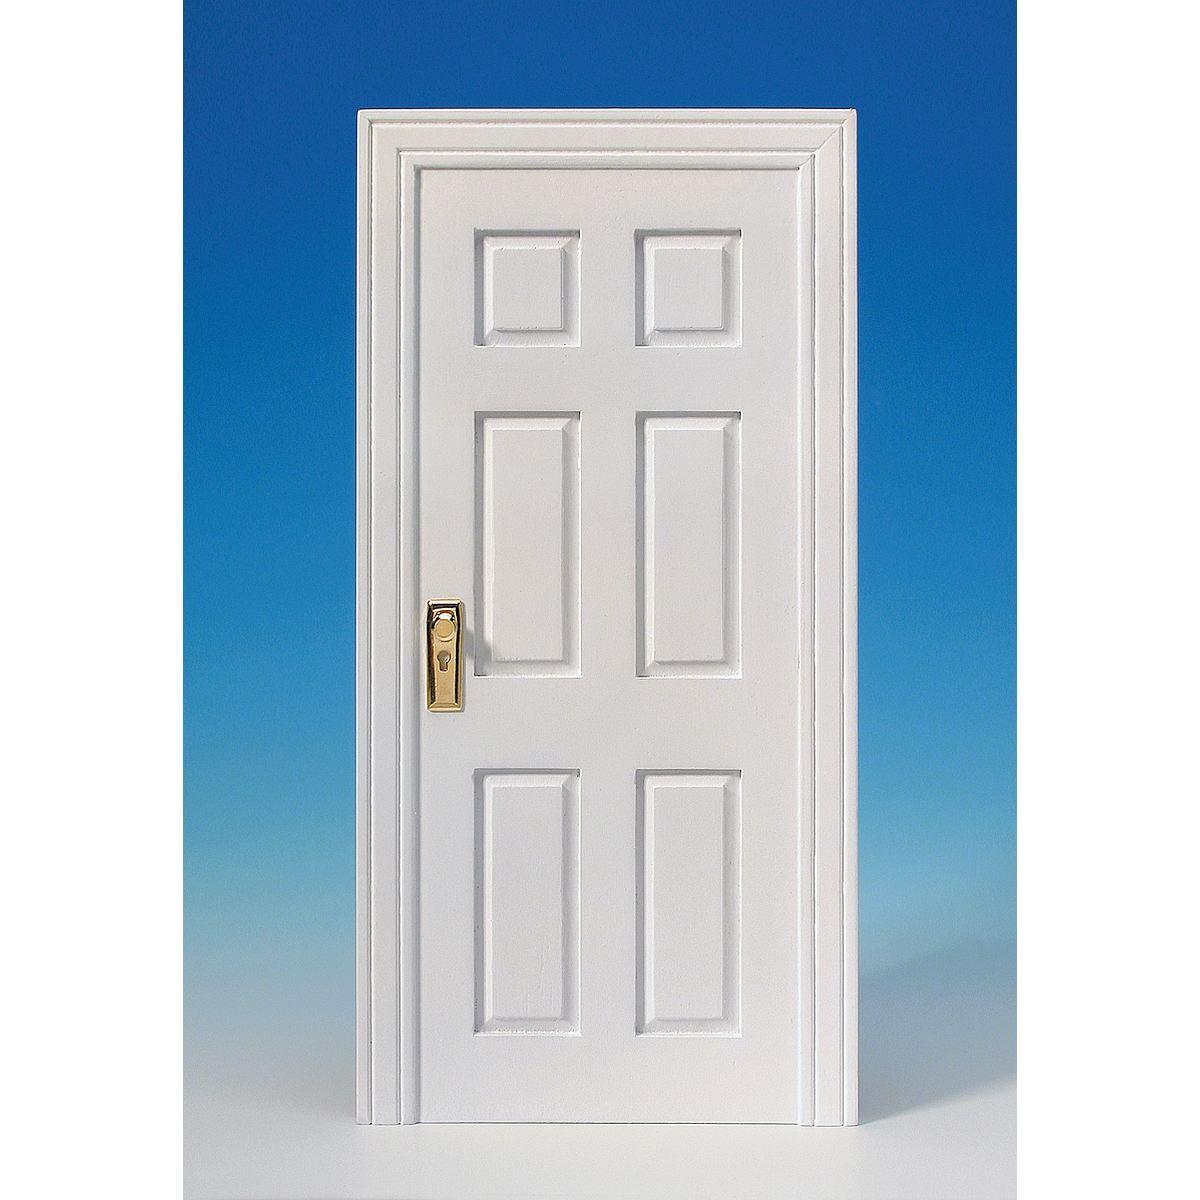 t r attrappe wei ideal f r die modul box 60311. Black Bedroom Furniture Sets. Home Design Ideas